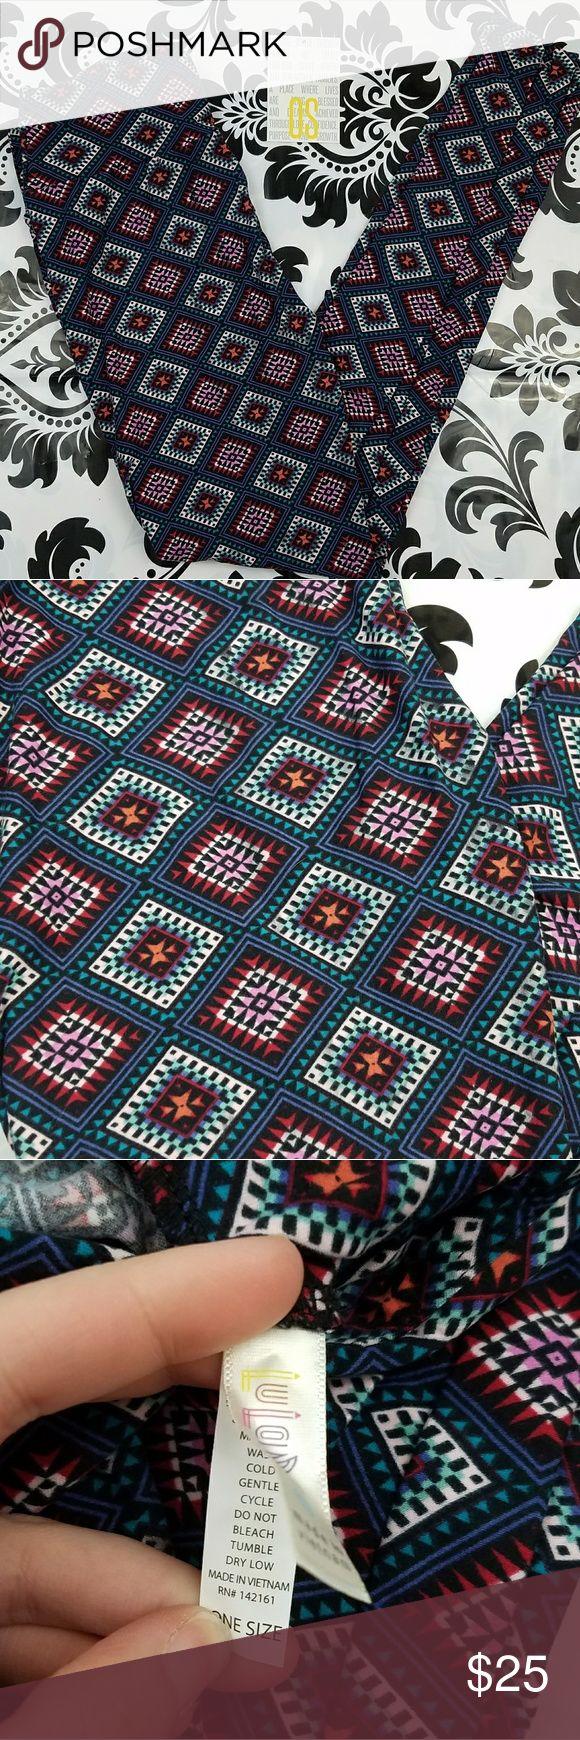 LuLaRoe One size tribal leggings Women's LuLaRoe one size leggings  BRAND NEW  Multicolored  Tribal print LuLaRoe Pants Leggings